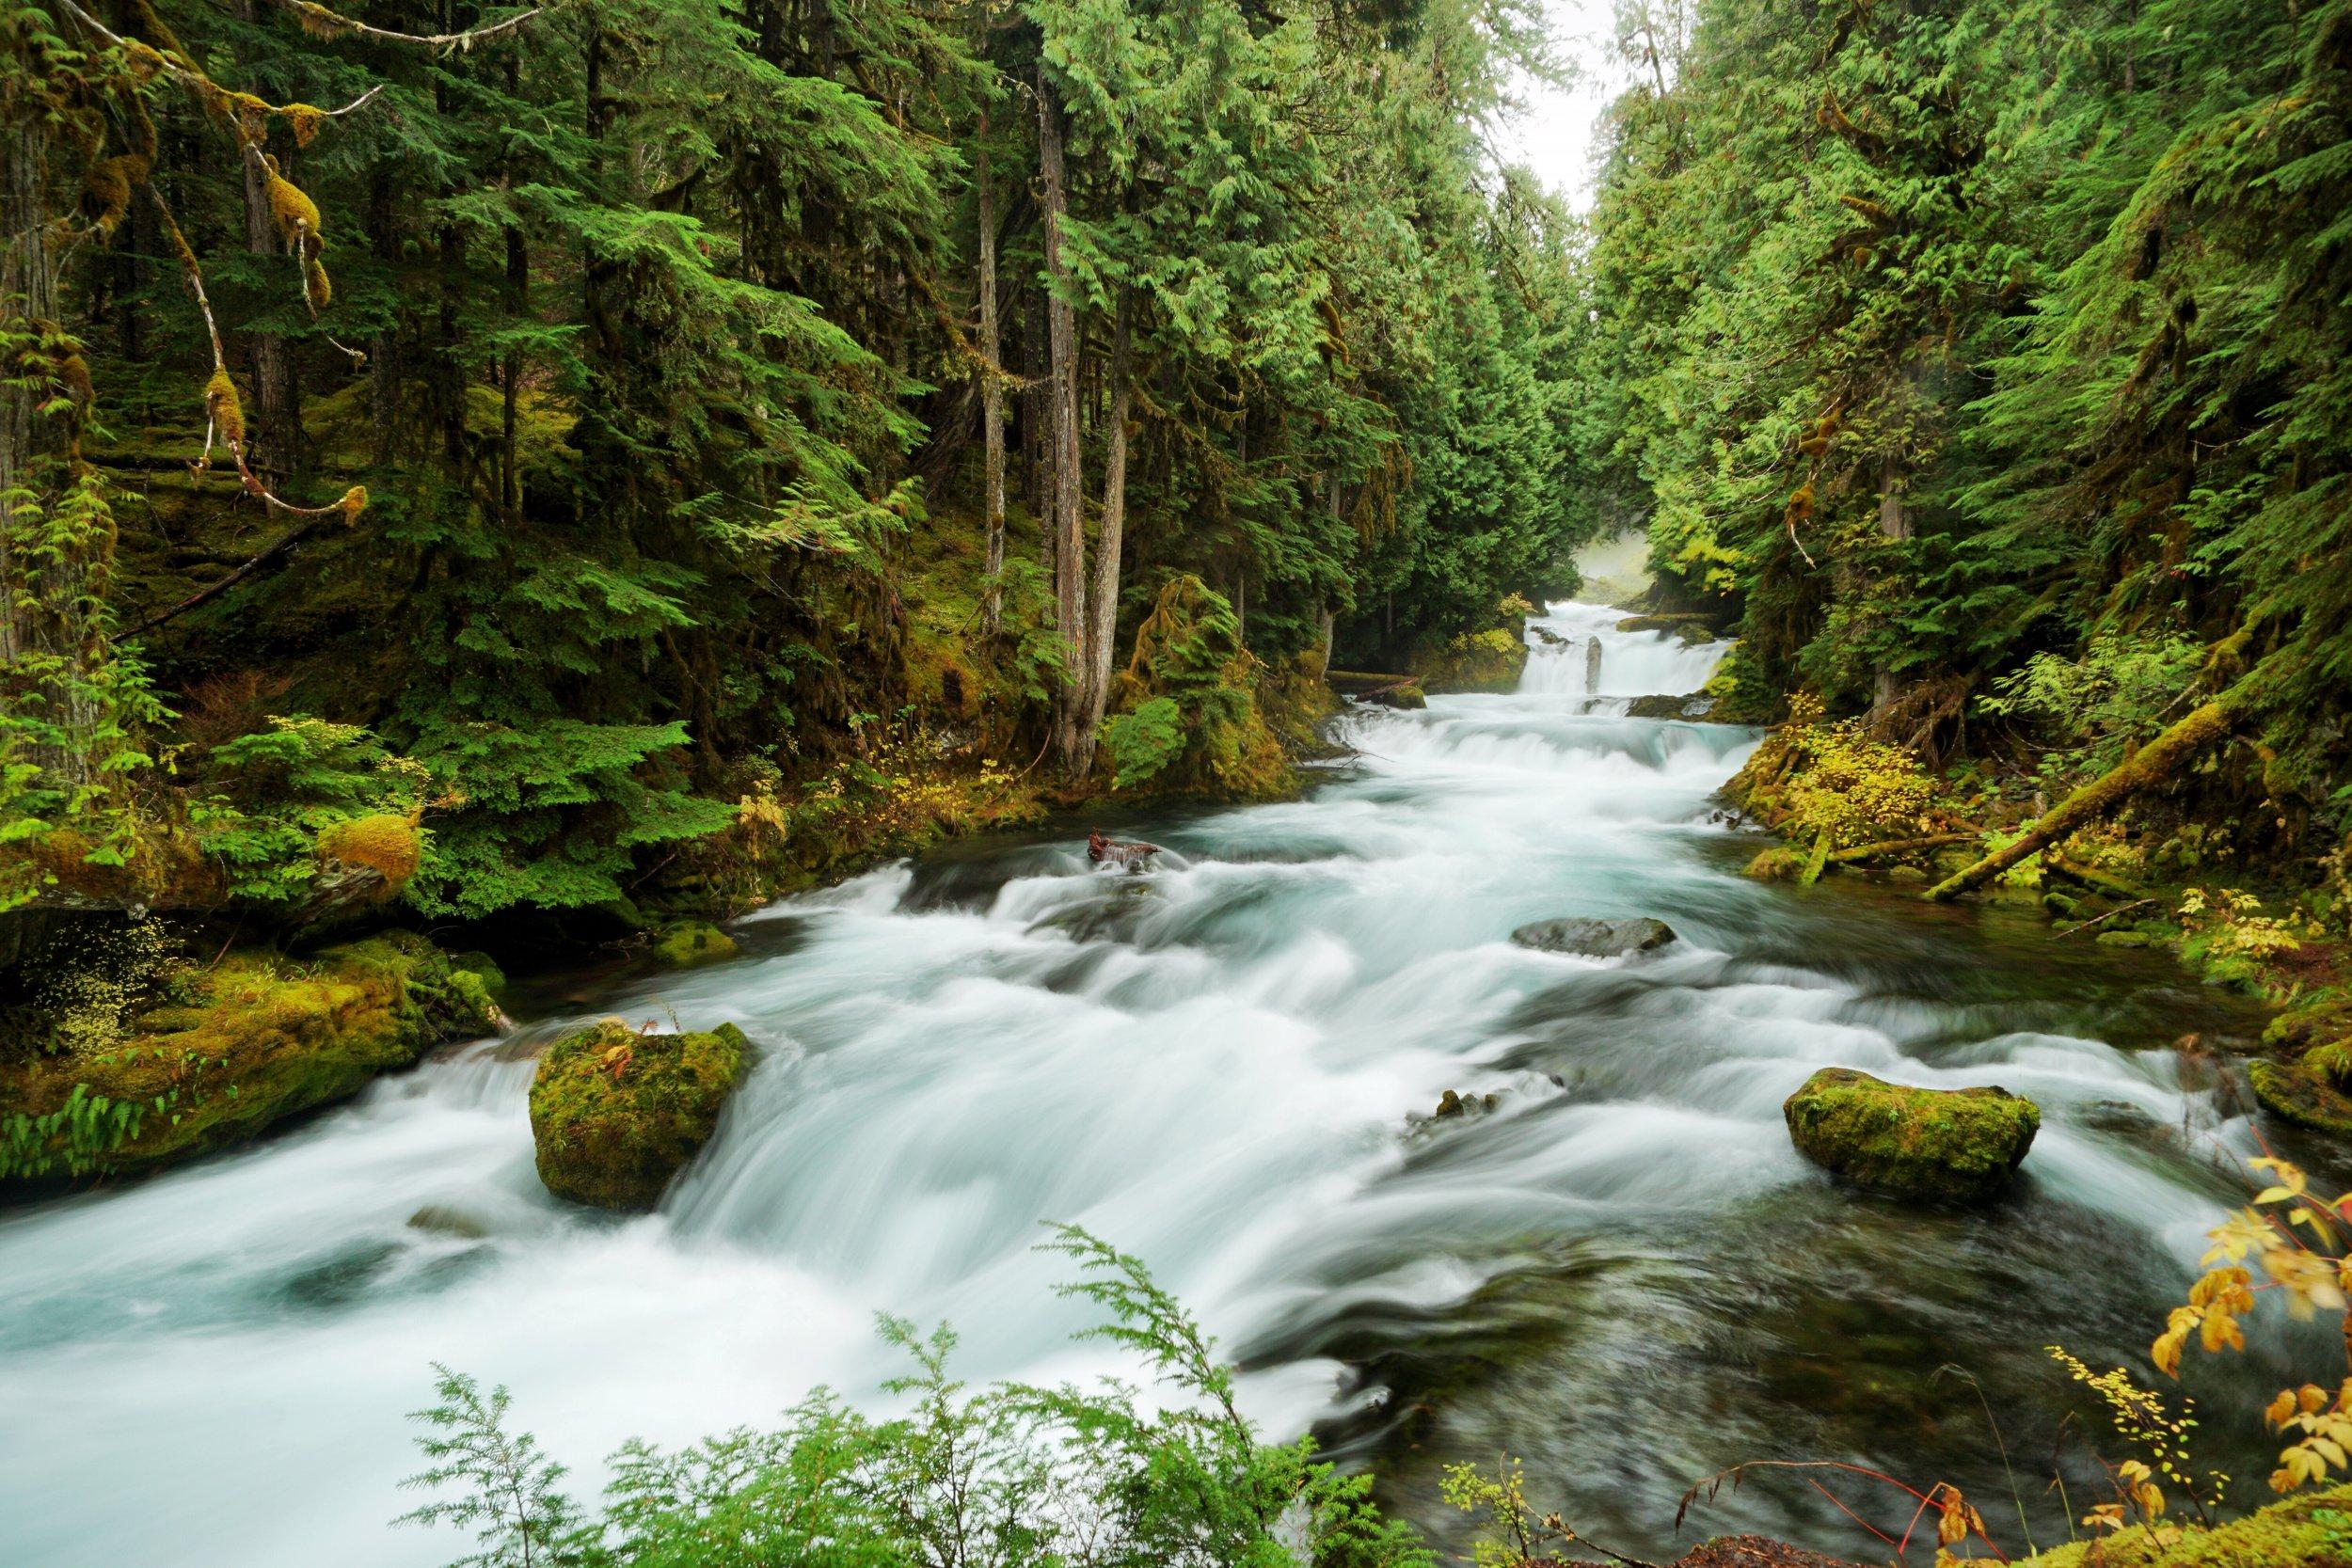 2. Sahalie Falls in Oregon